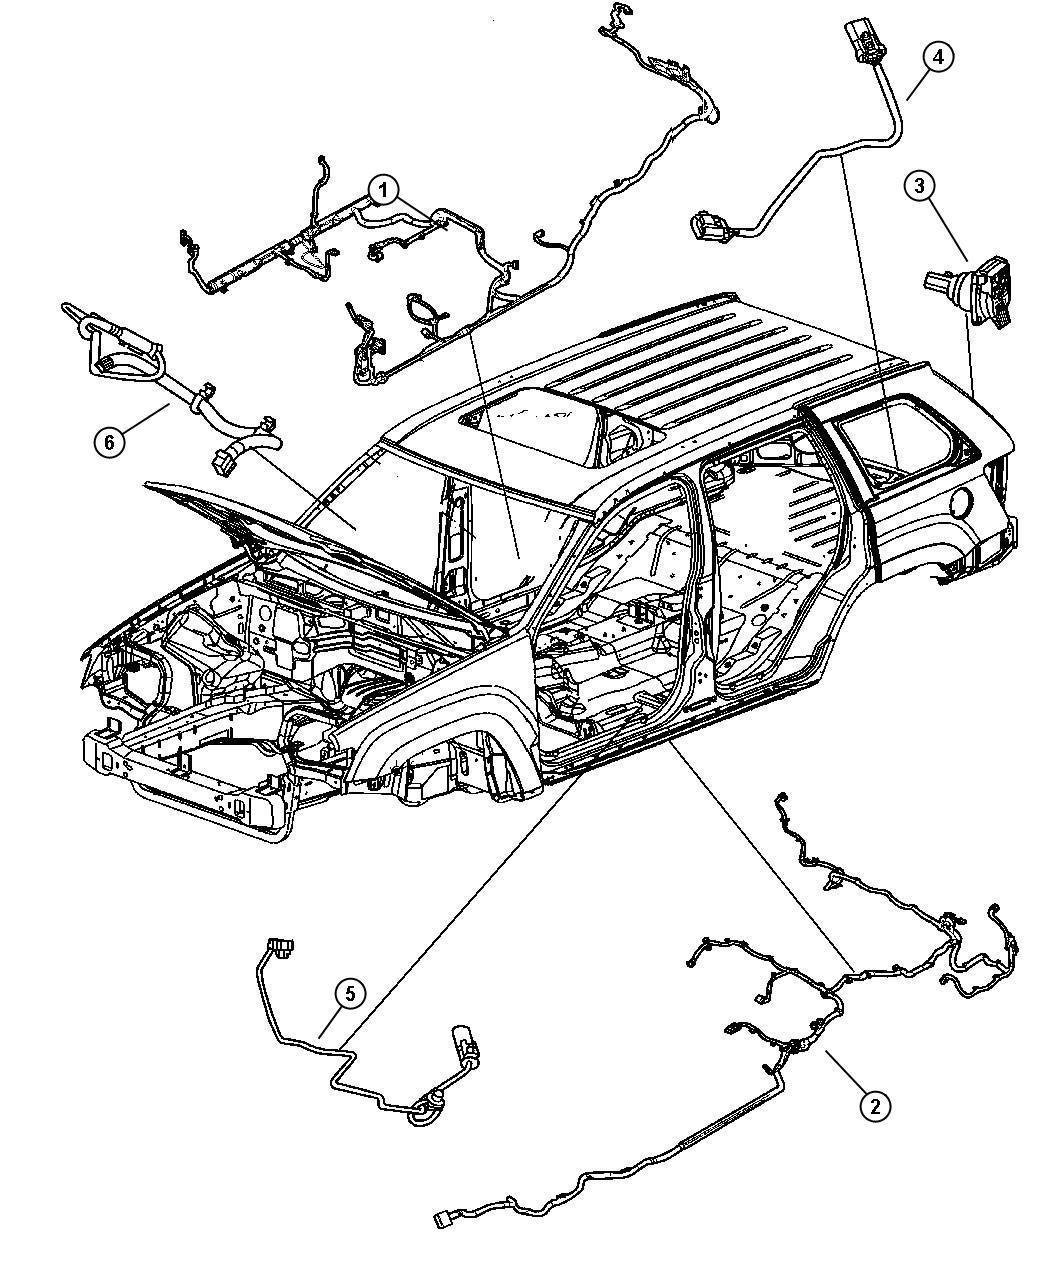 Jeep Grand Cherokee Wiring Fuel Module Tank Skid